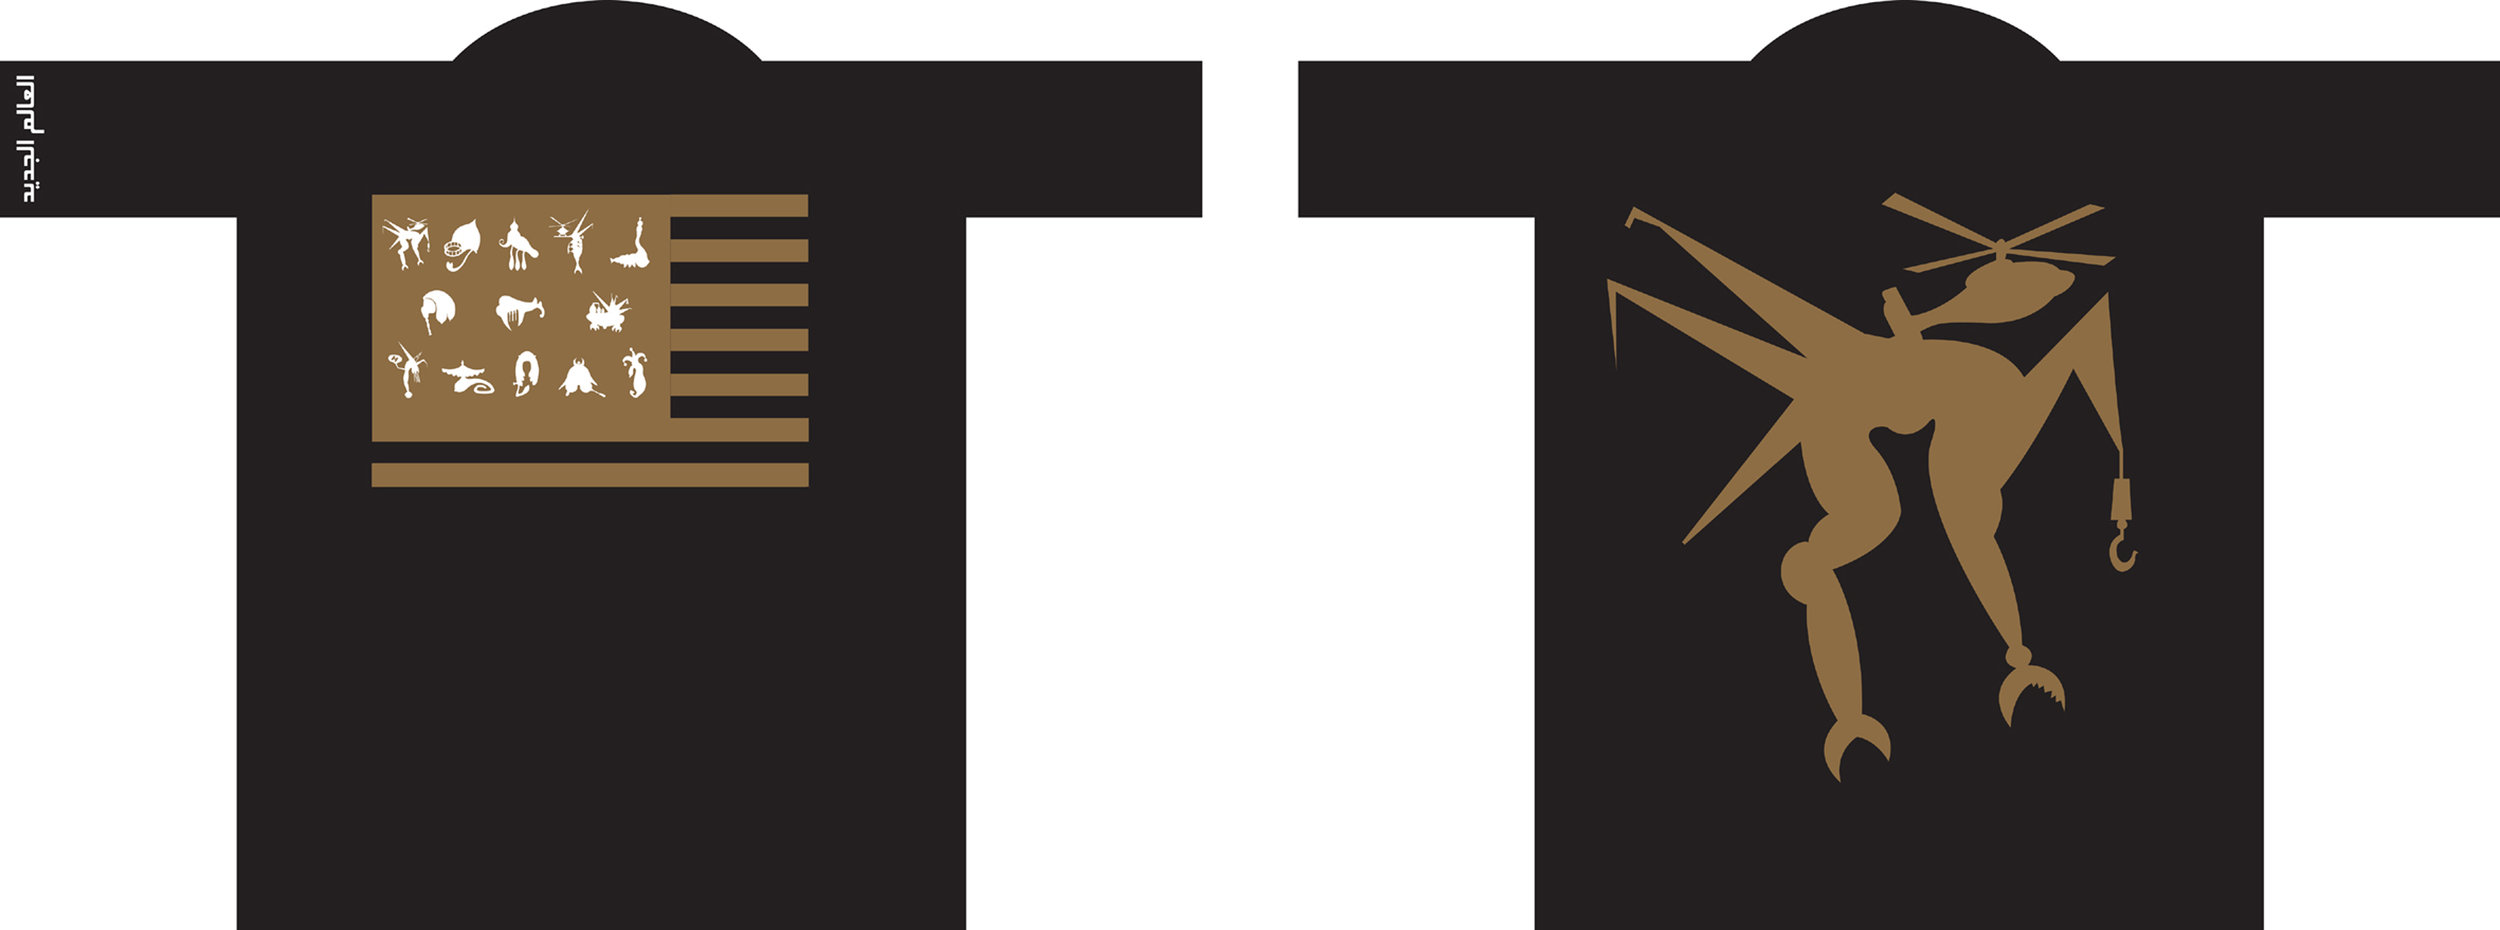 The New World (Tshirt), 2006